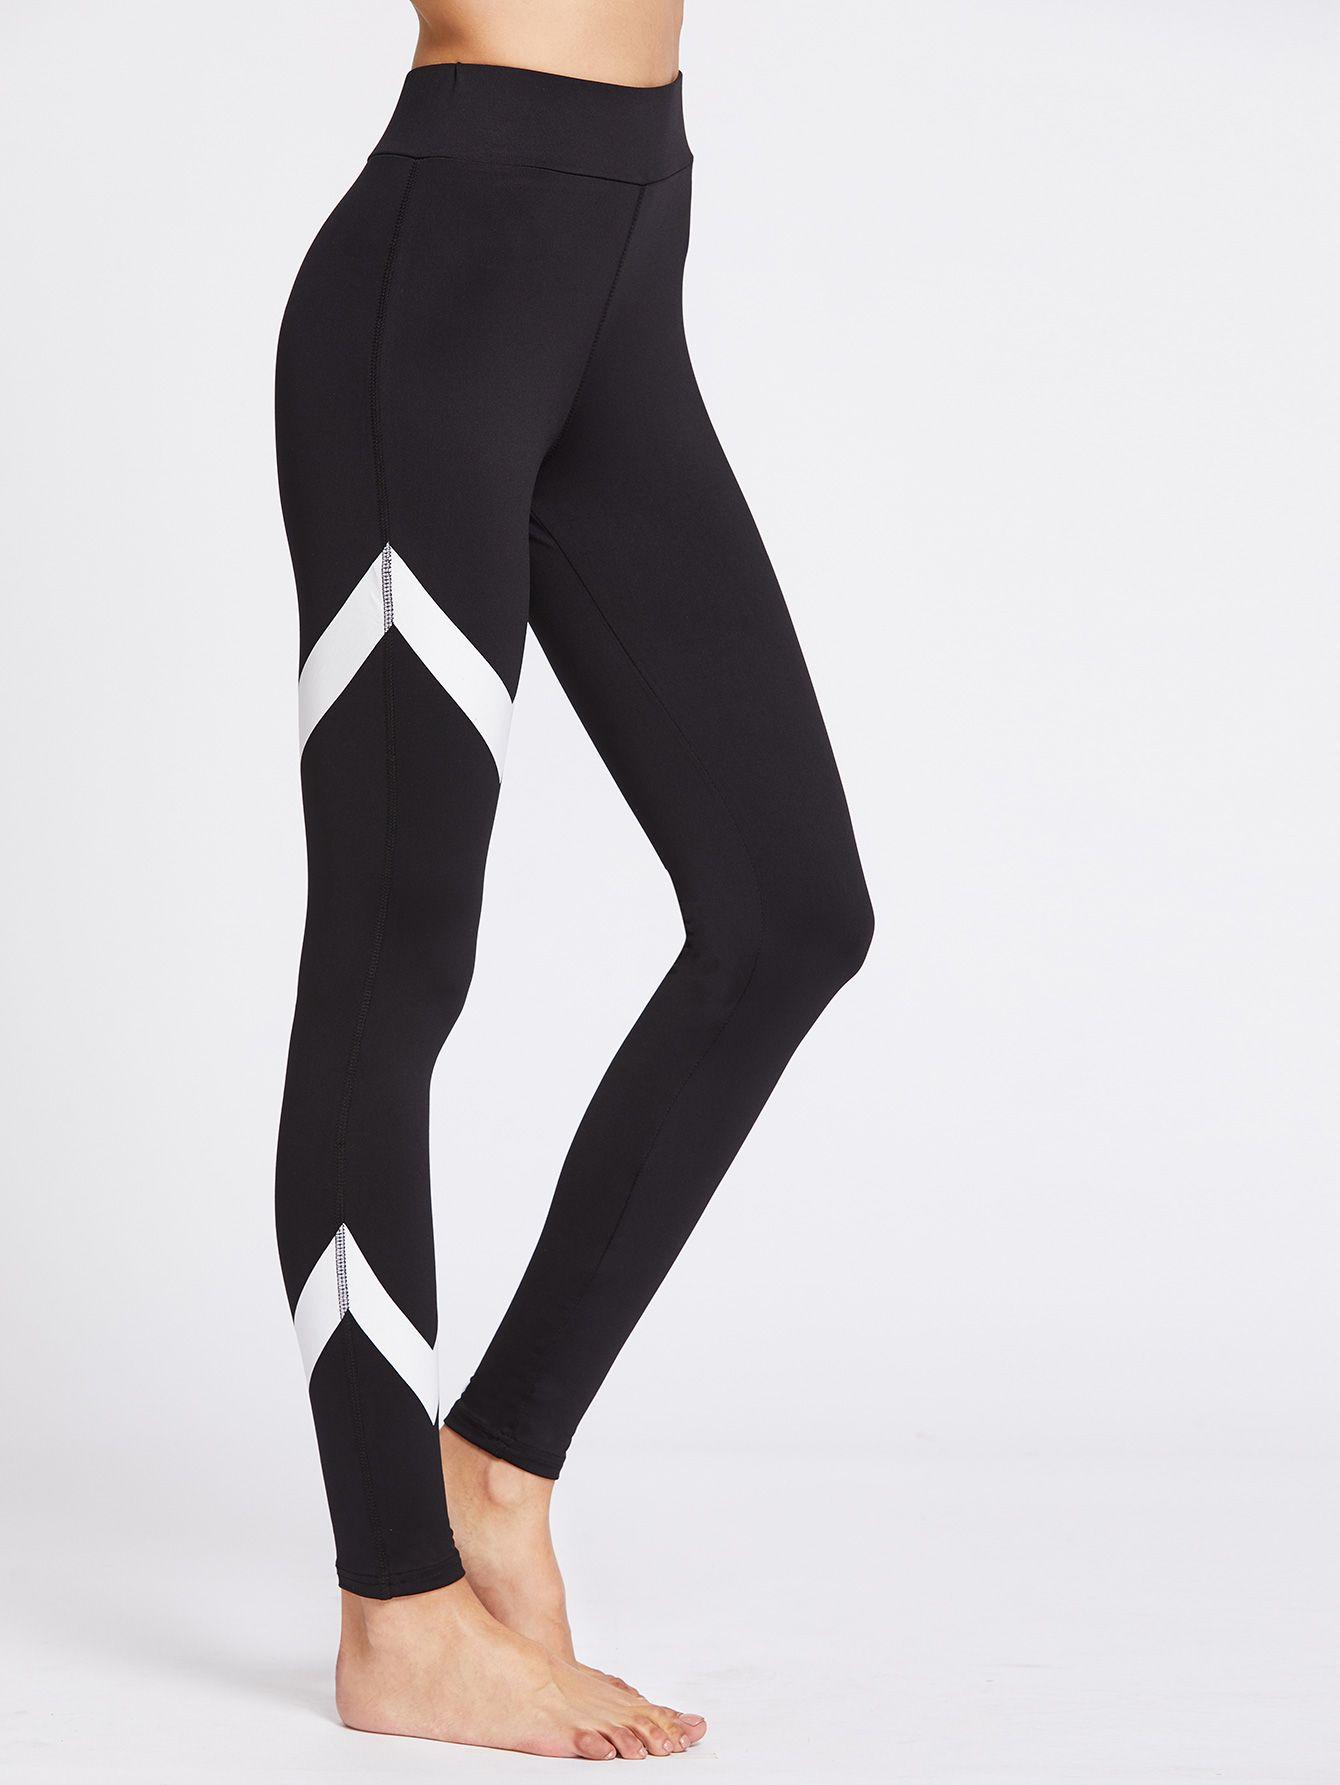 1b4d4665f8441 Shop Chevron Pattern Gym Leggings online. SheIn offers Chevron Pattern Gym  Leggings & more to fit your fashionable needs.